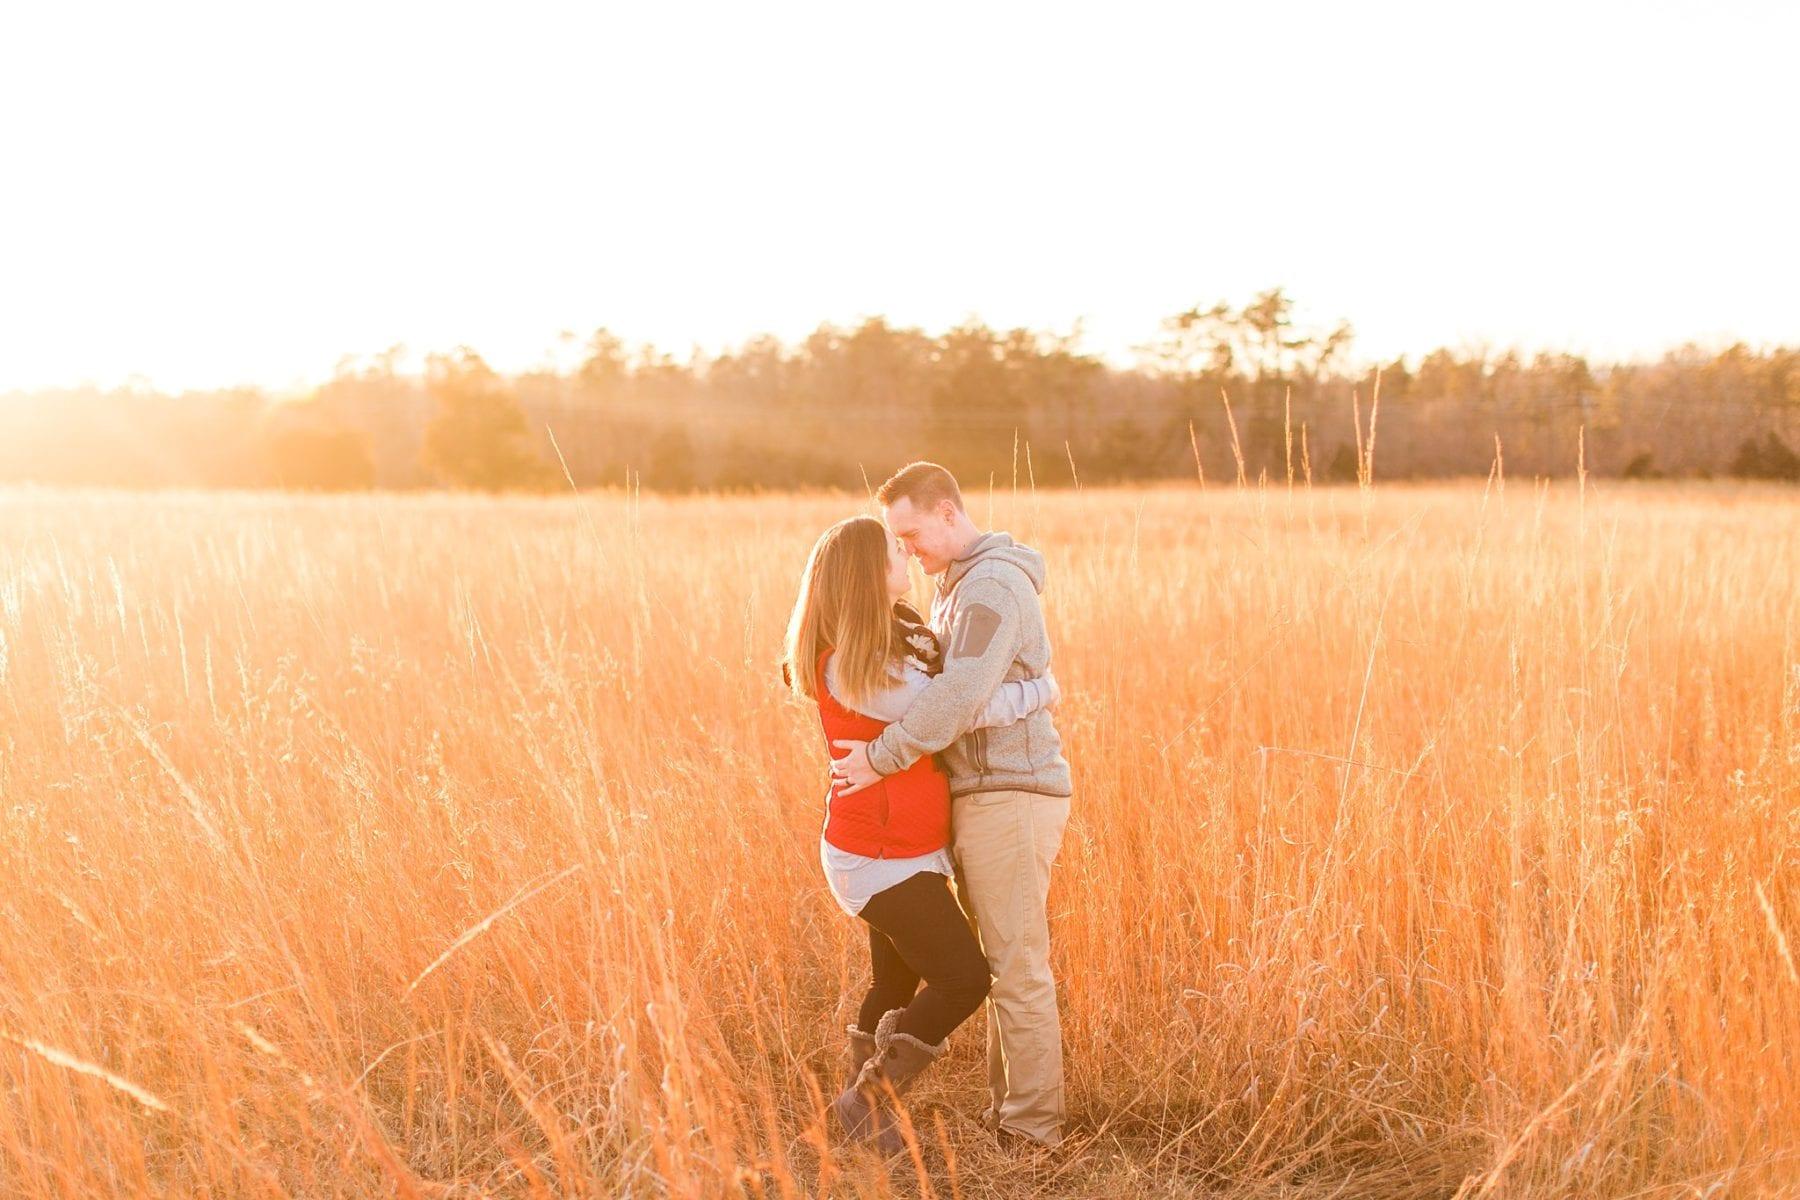 Firefighter Baby Announcement Virginia Photographer Megan Kelsey Photography Jeromy & Becky-203.jpg